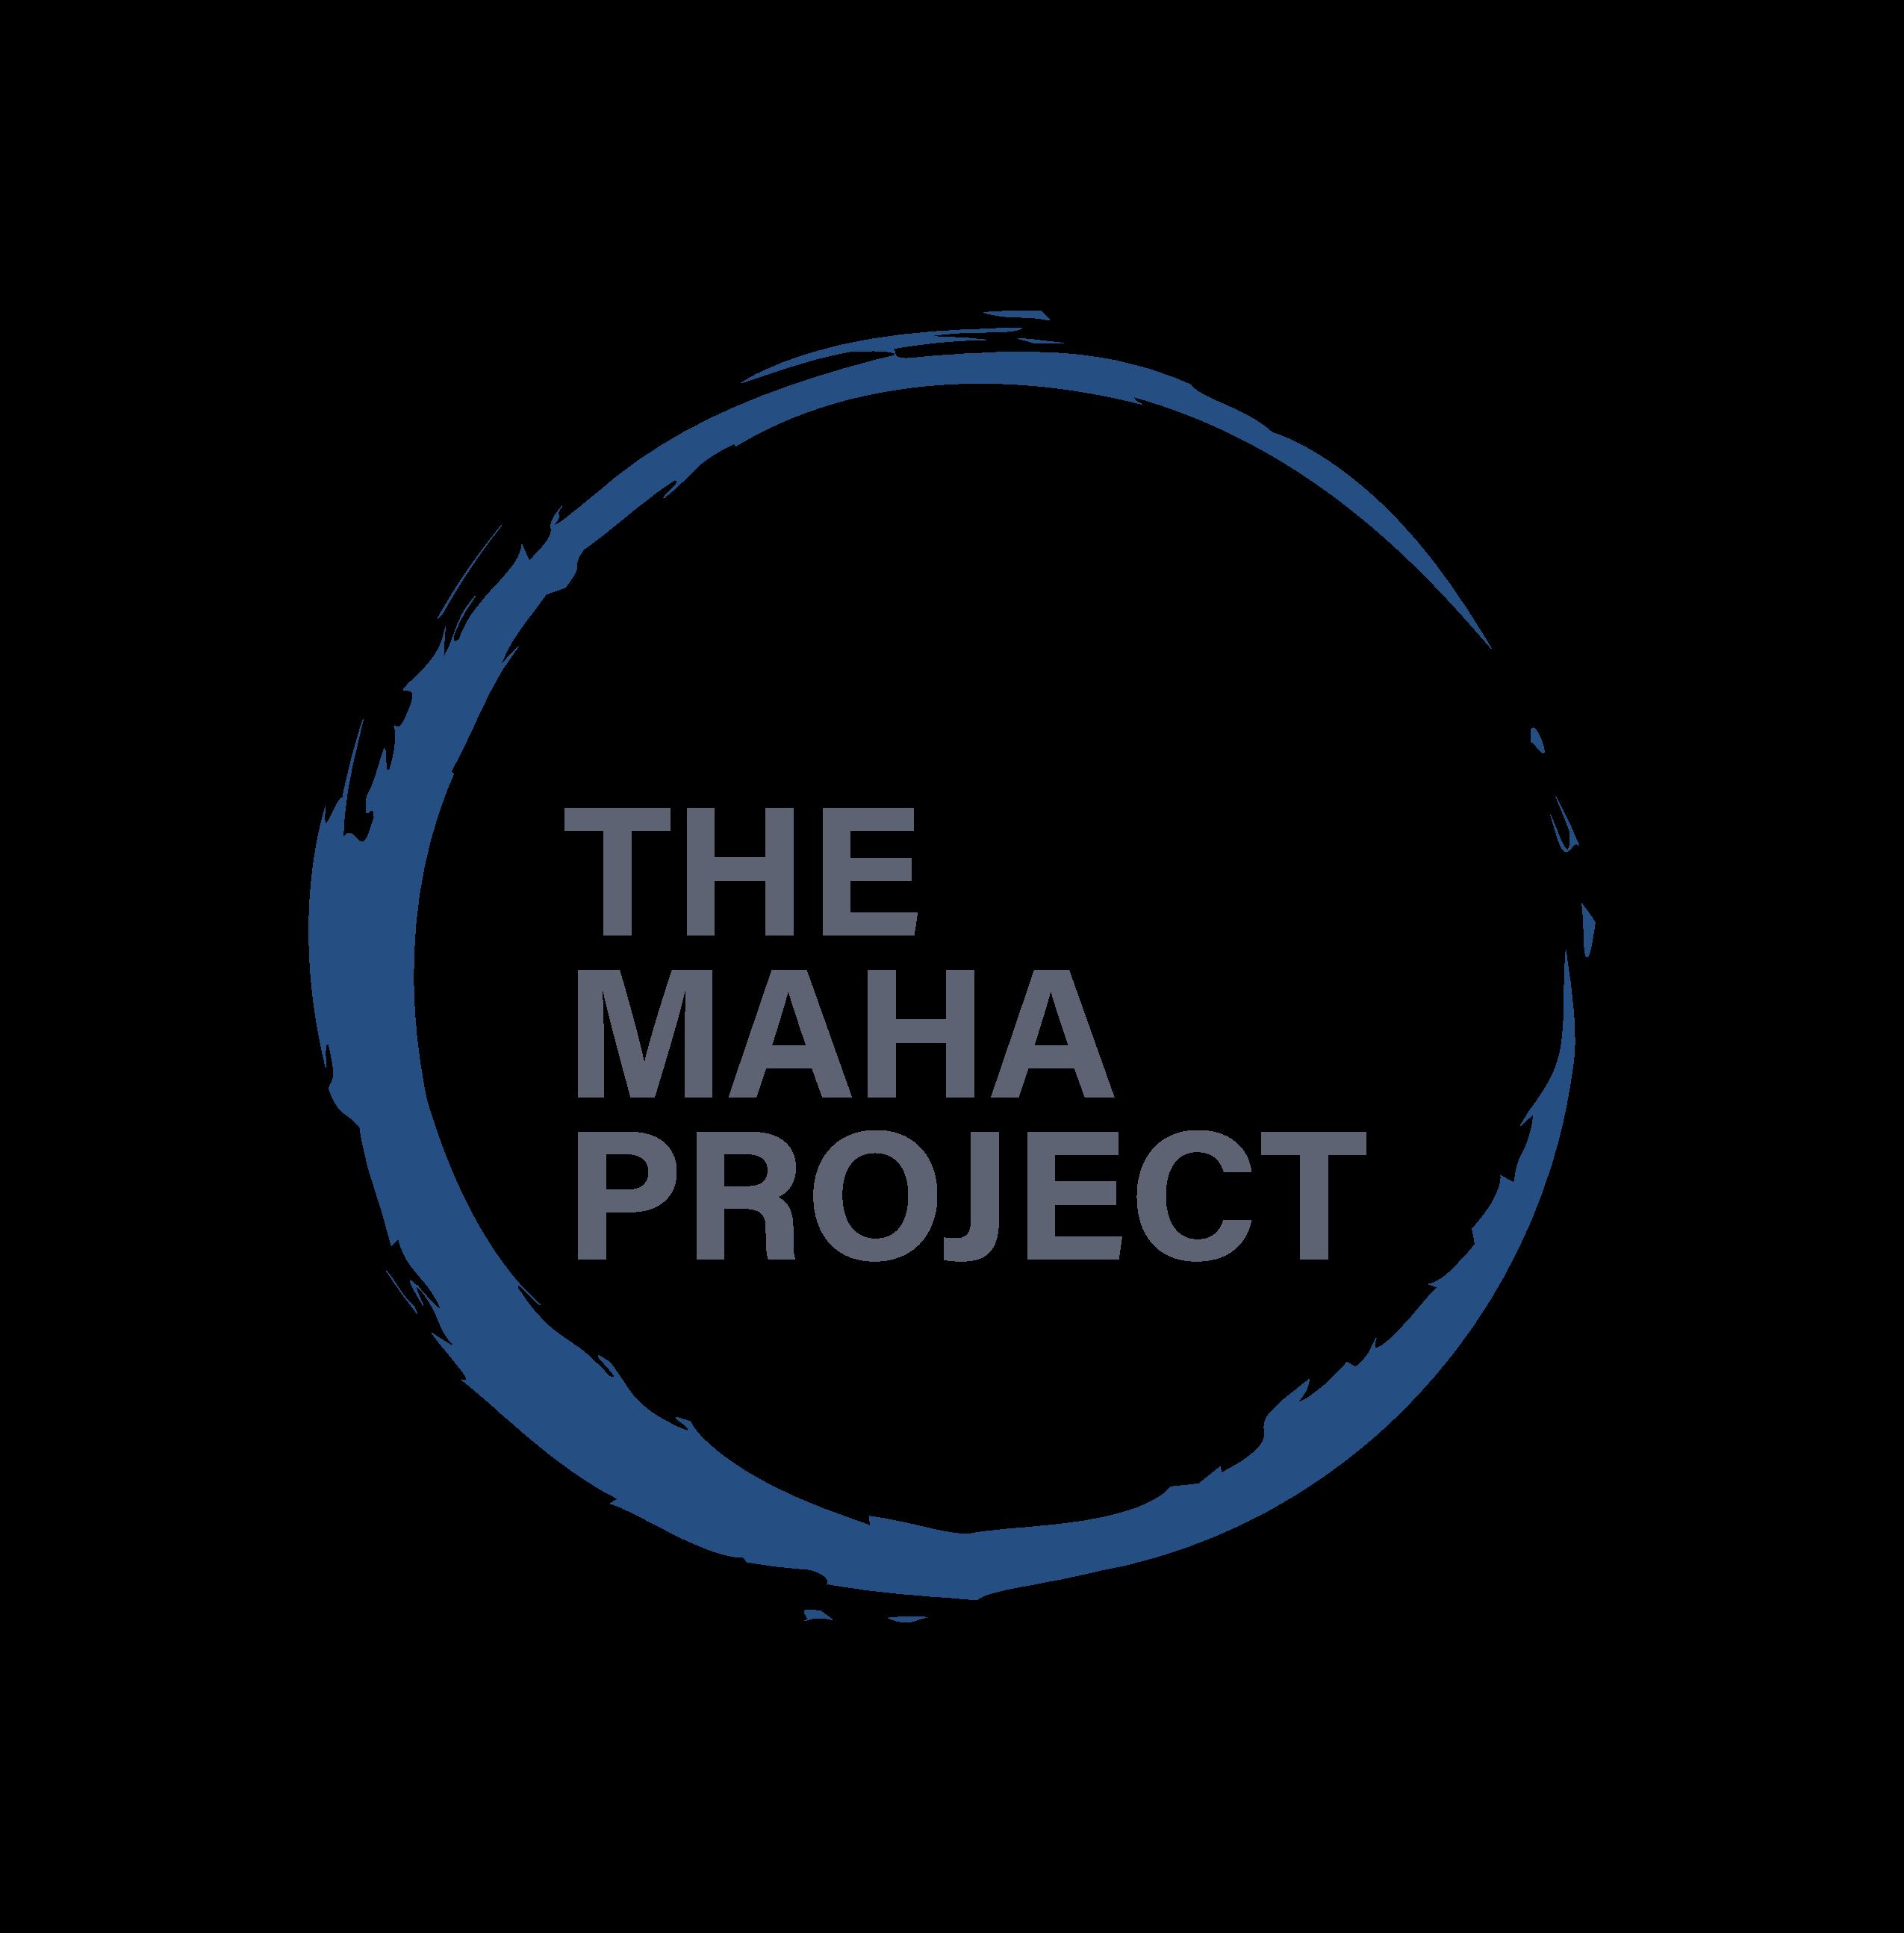 The Maha Project